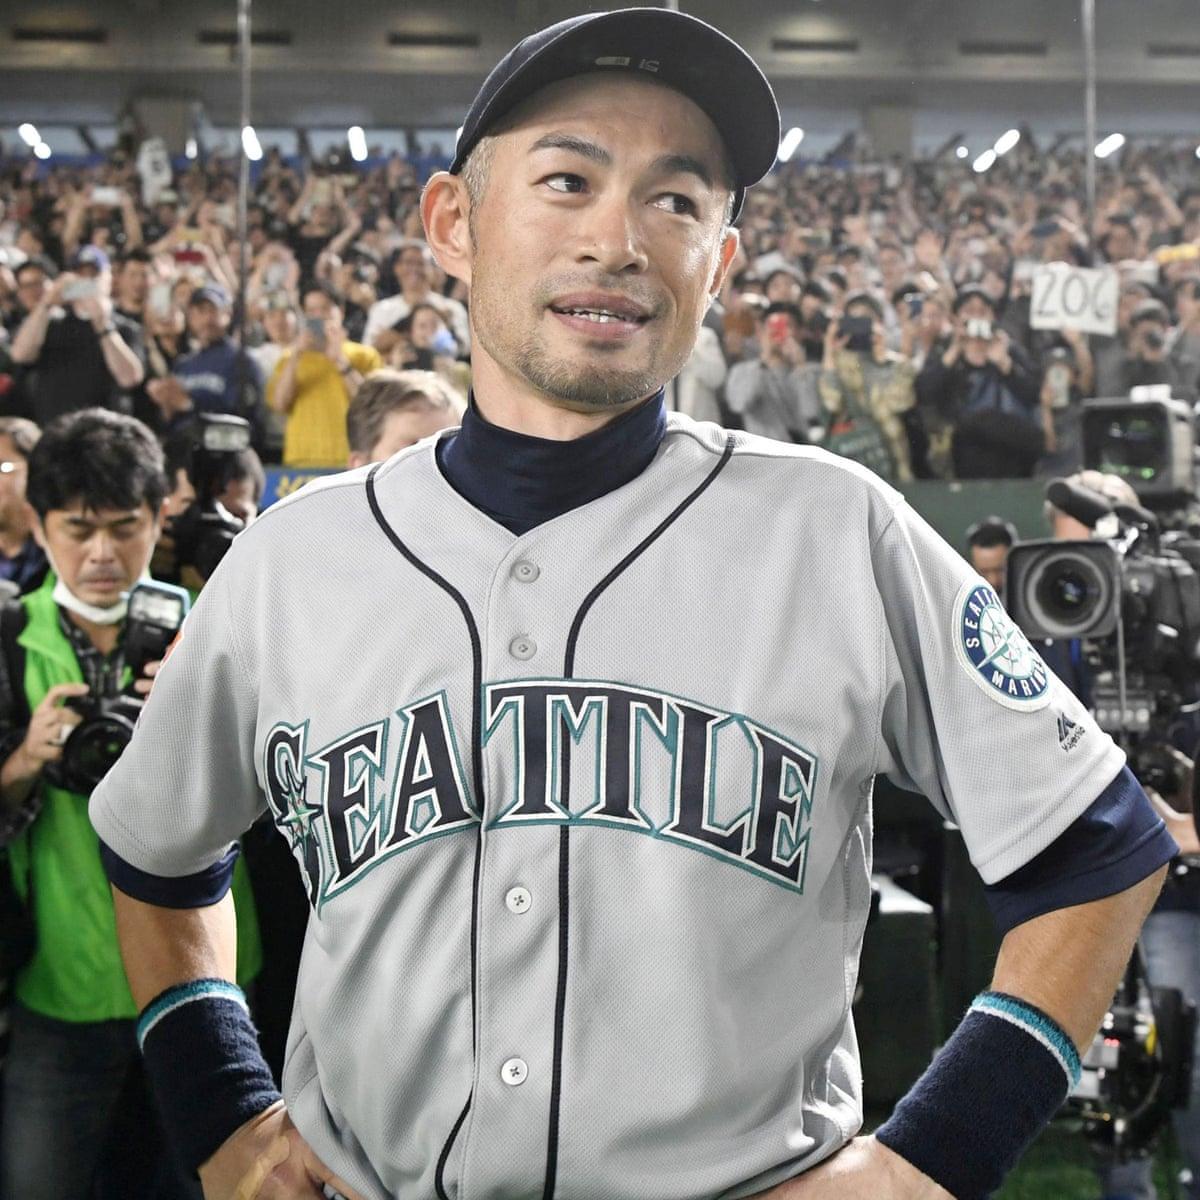 Ichiro Suzuki retires to ovation after sparkling 27-year baseball career |  Sport | The Guardian